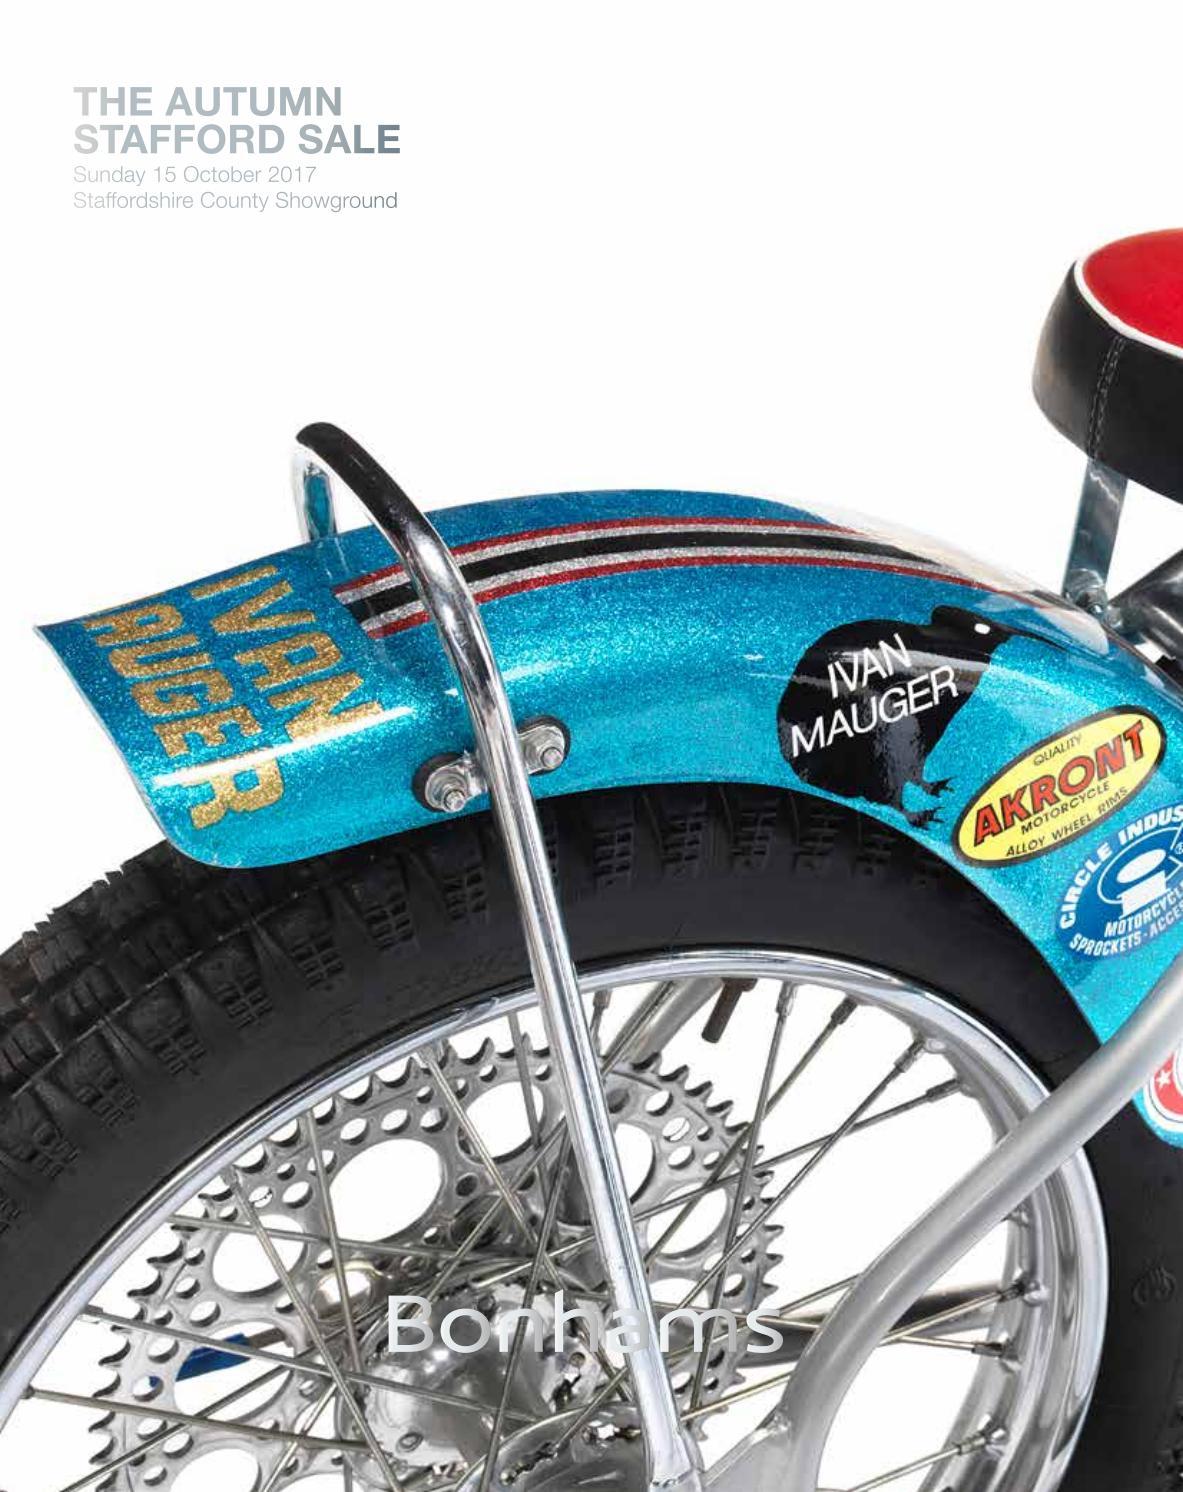 universal rear shock absorbers 340 mm forsa ducati guzzi gilera covered